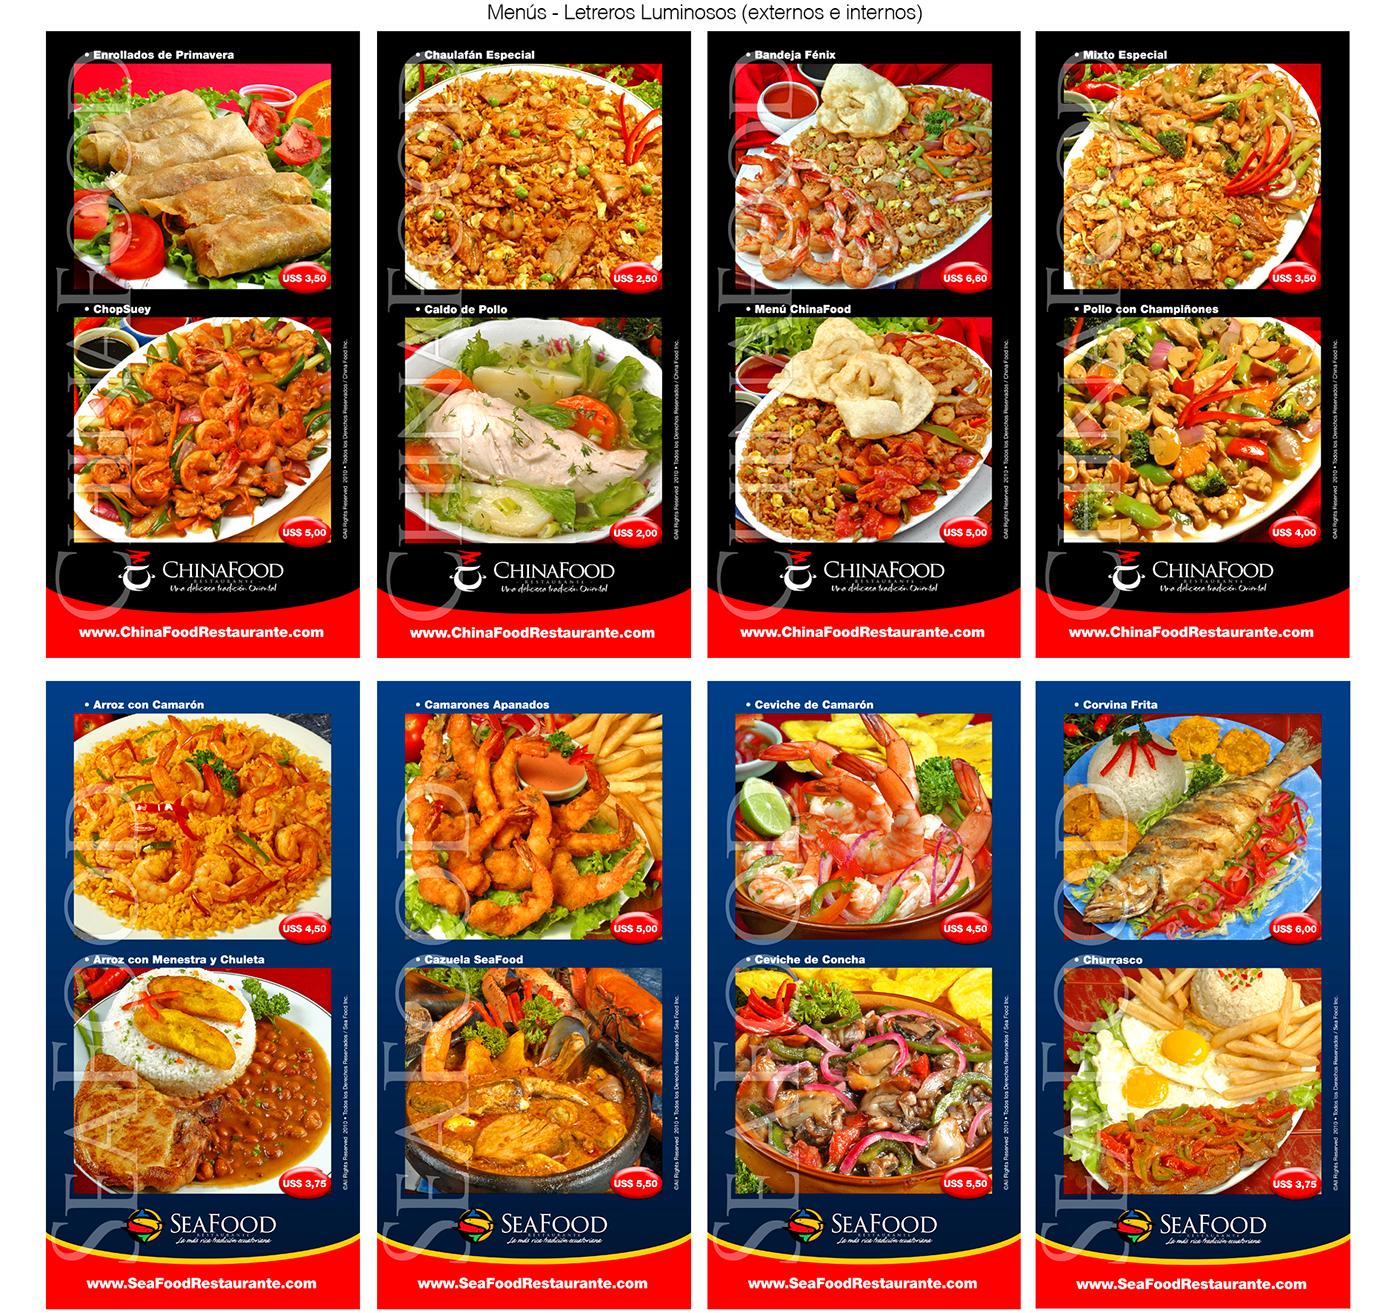 seafood chinafood restaurant ecuadorian foods gastronomy logos brochure posters color Ecuador